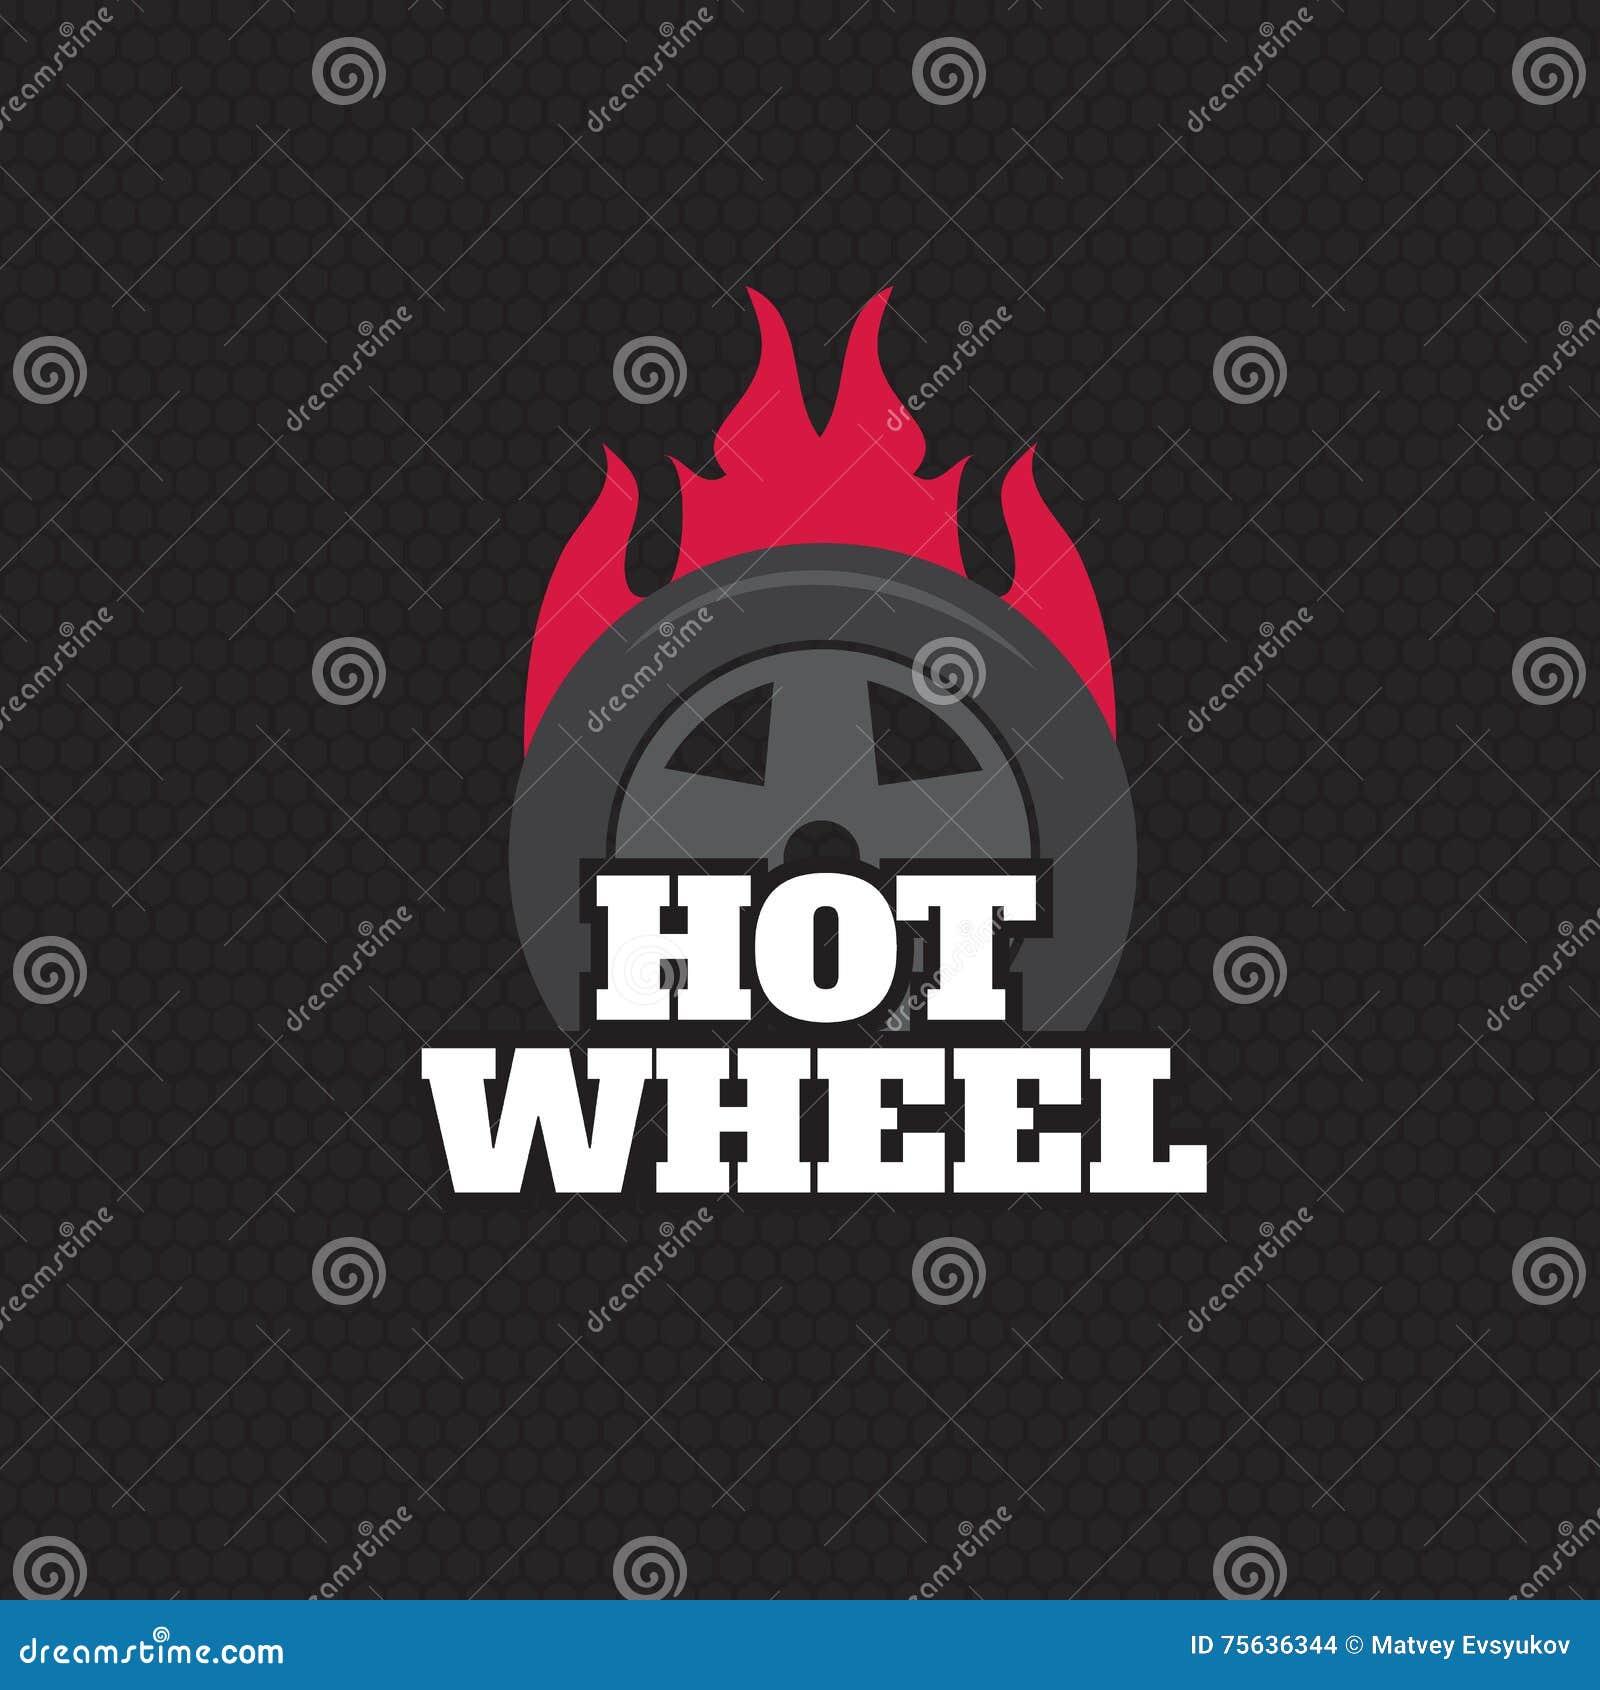 Red Hot Wheel Logo Stock Illustrations – 44 Red Hot Wheel Logo ...